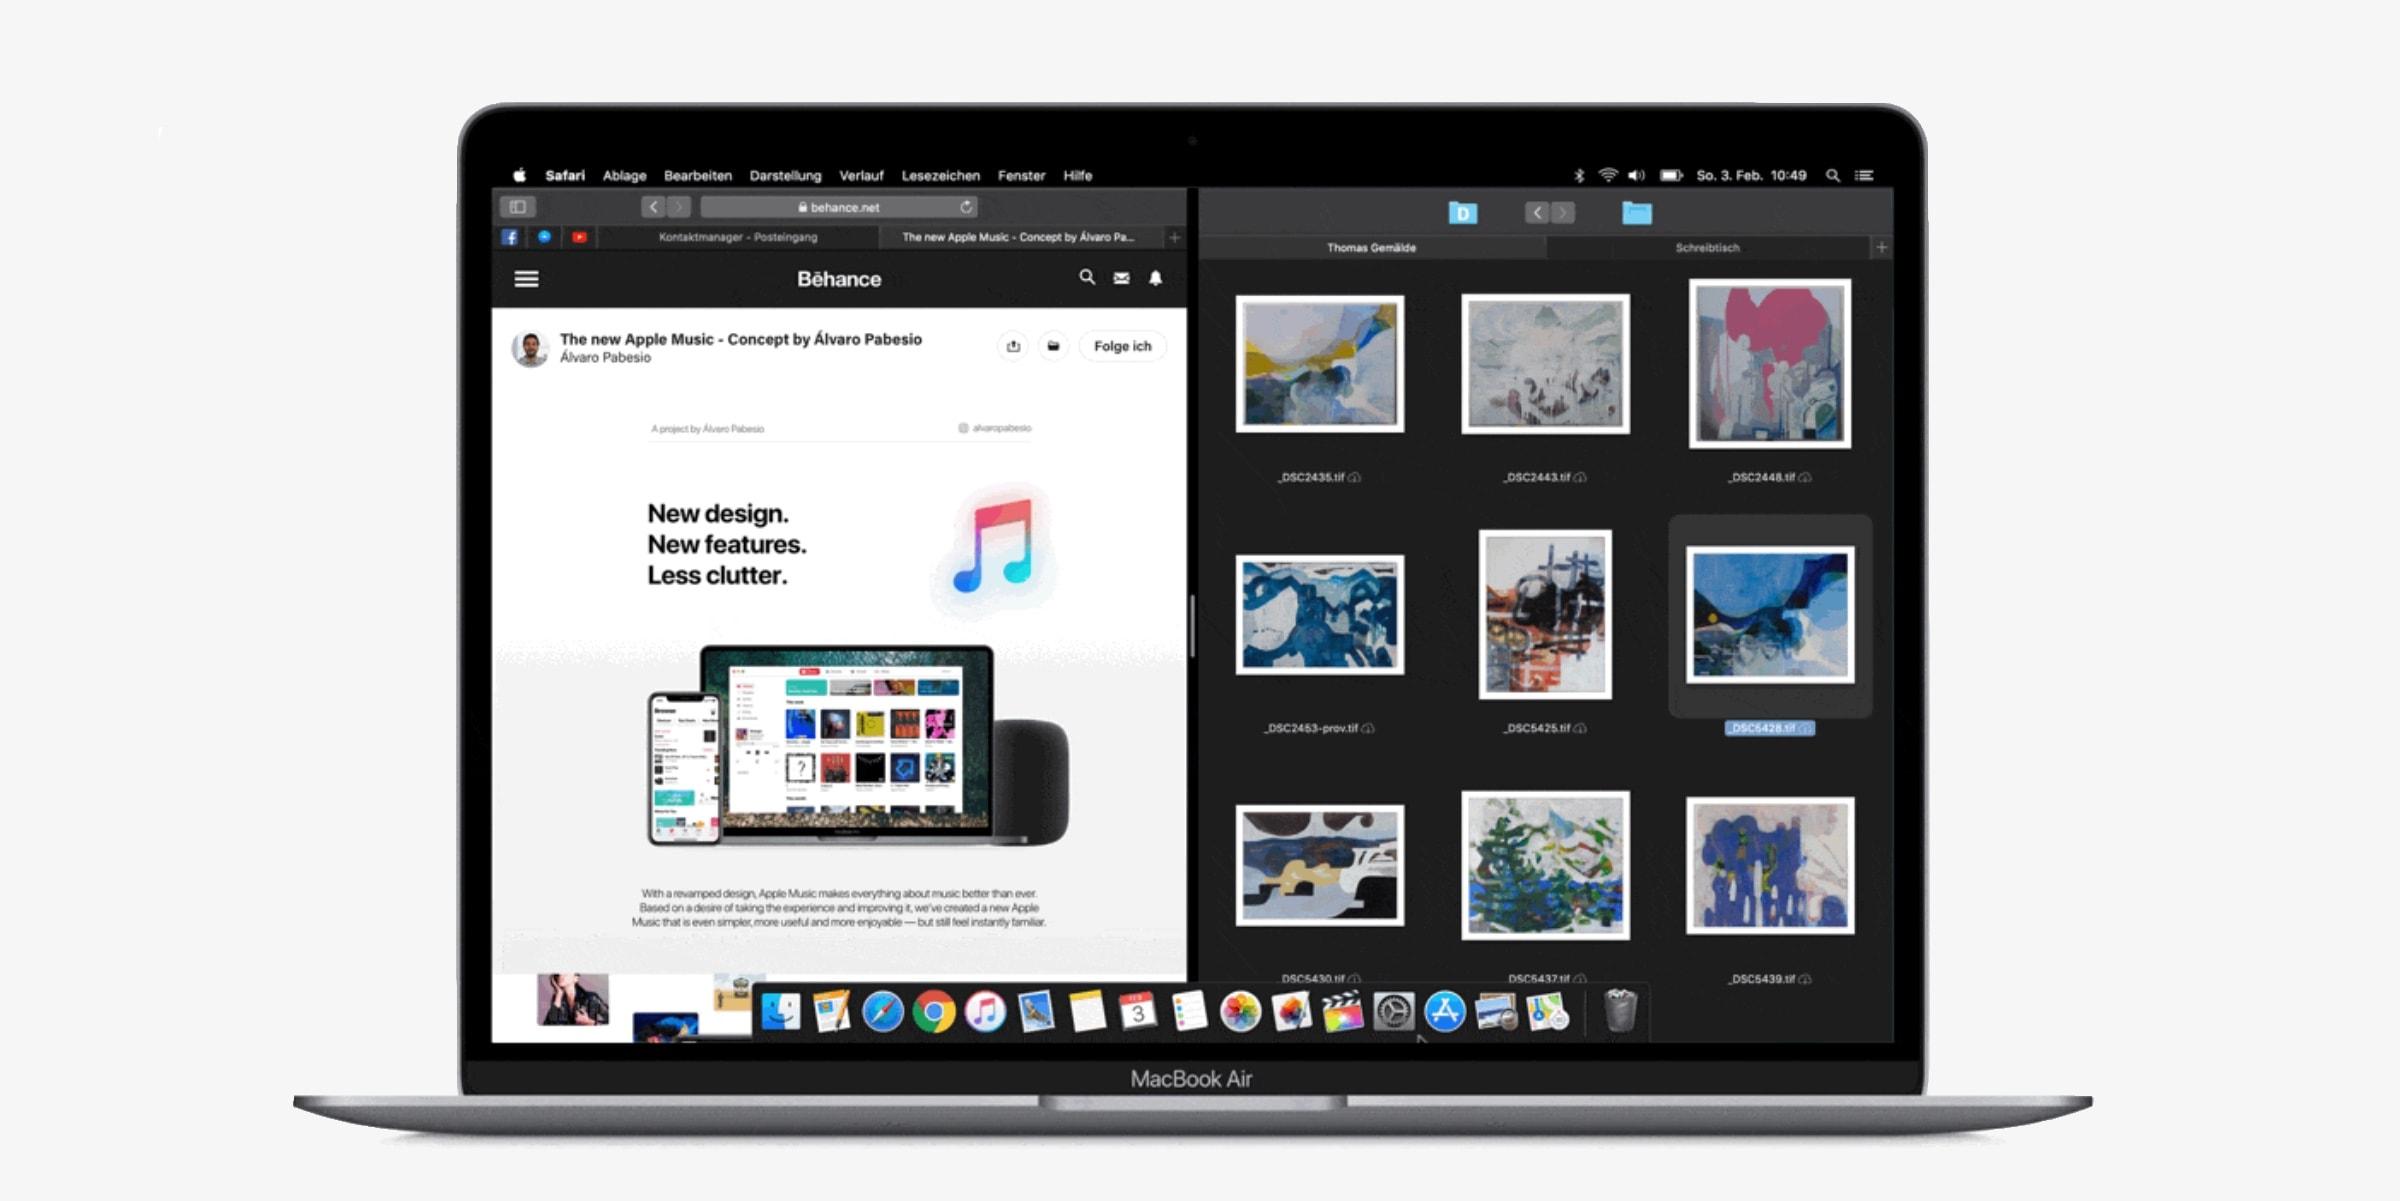 Perhaps the MacBook should adopt split-screen multitasking instead of floating windows.